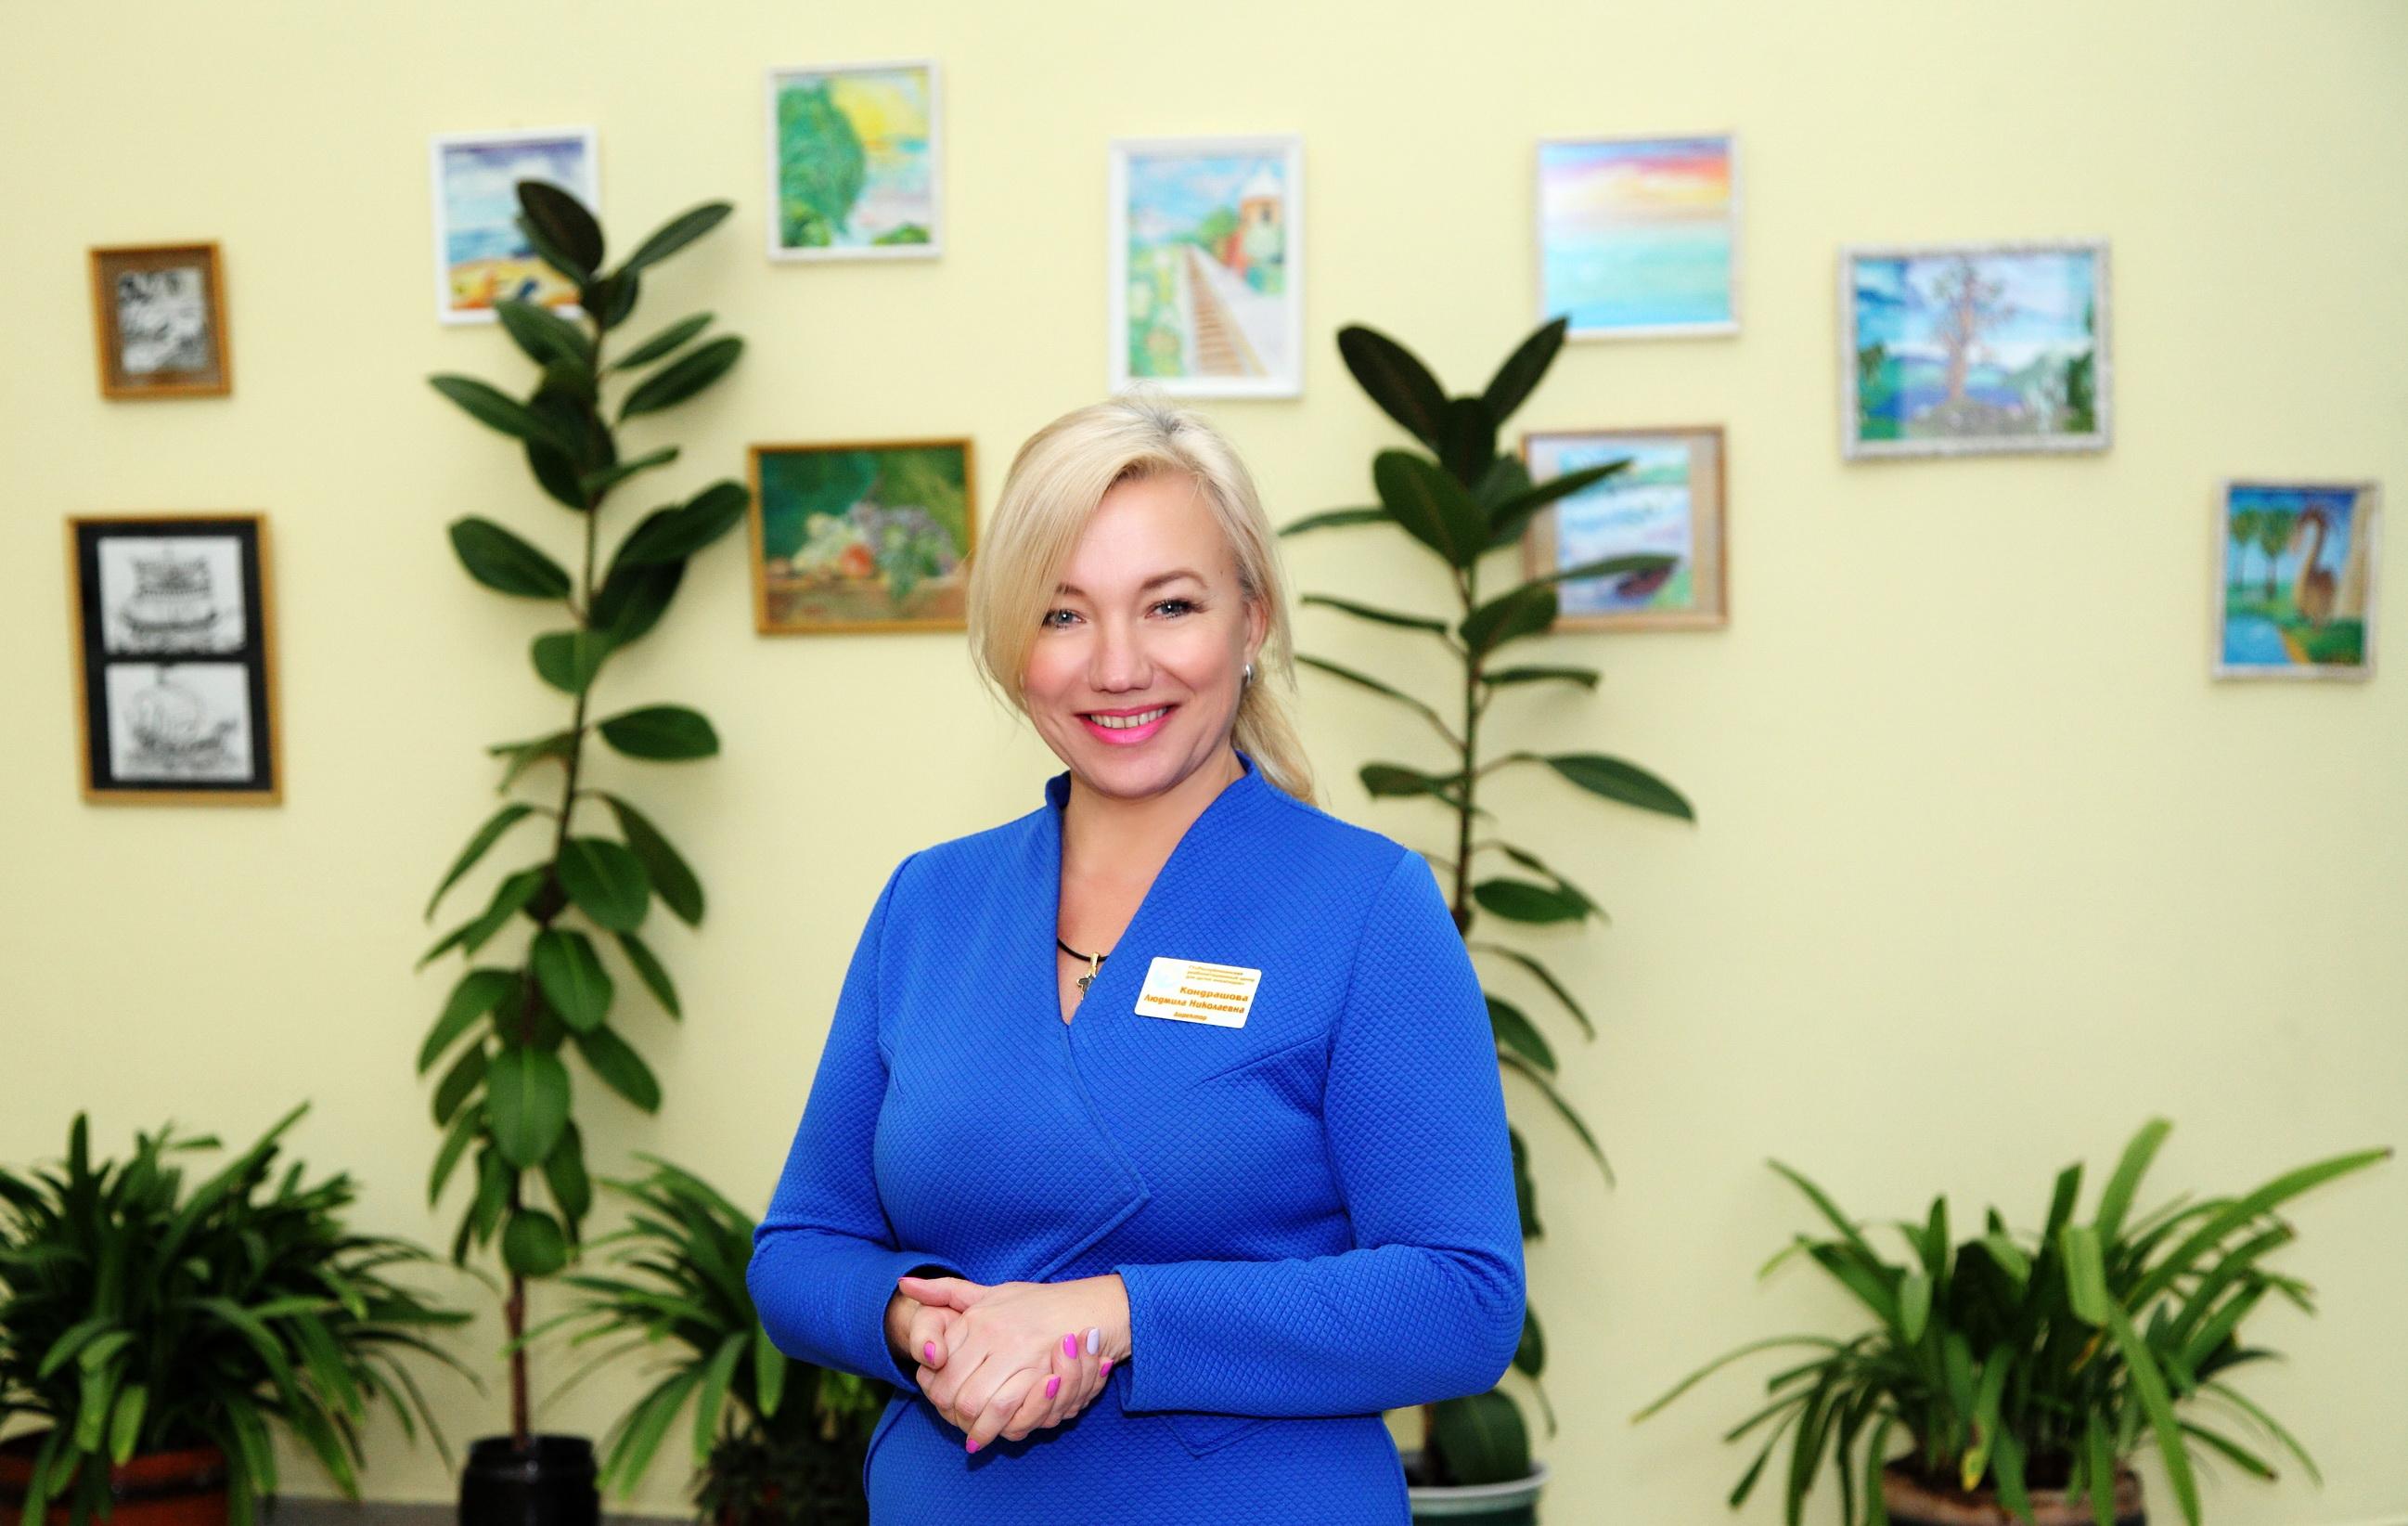 Кондрашова Людмила Николаевна